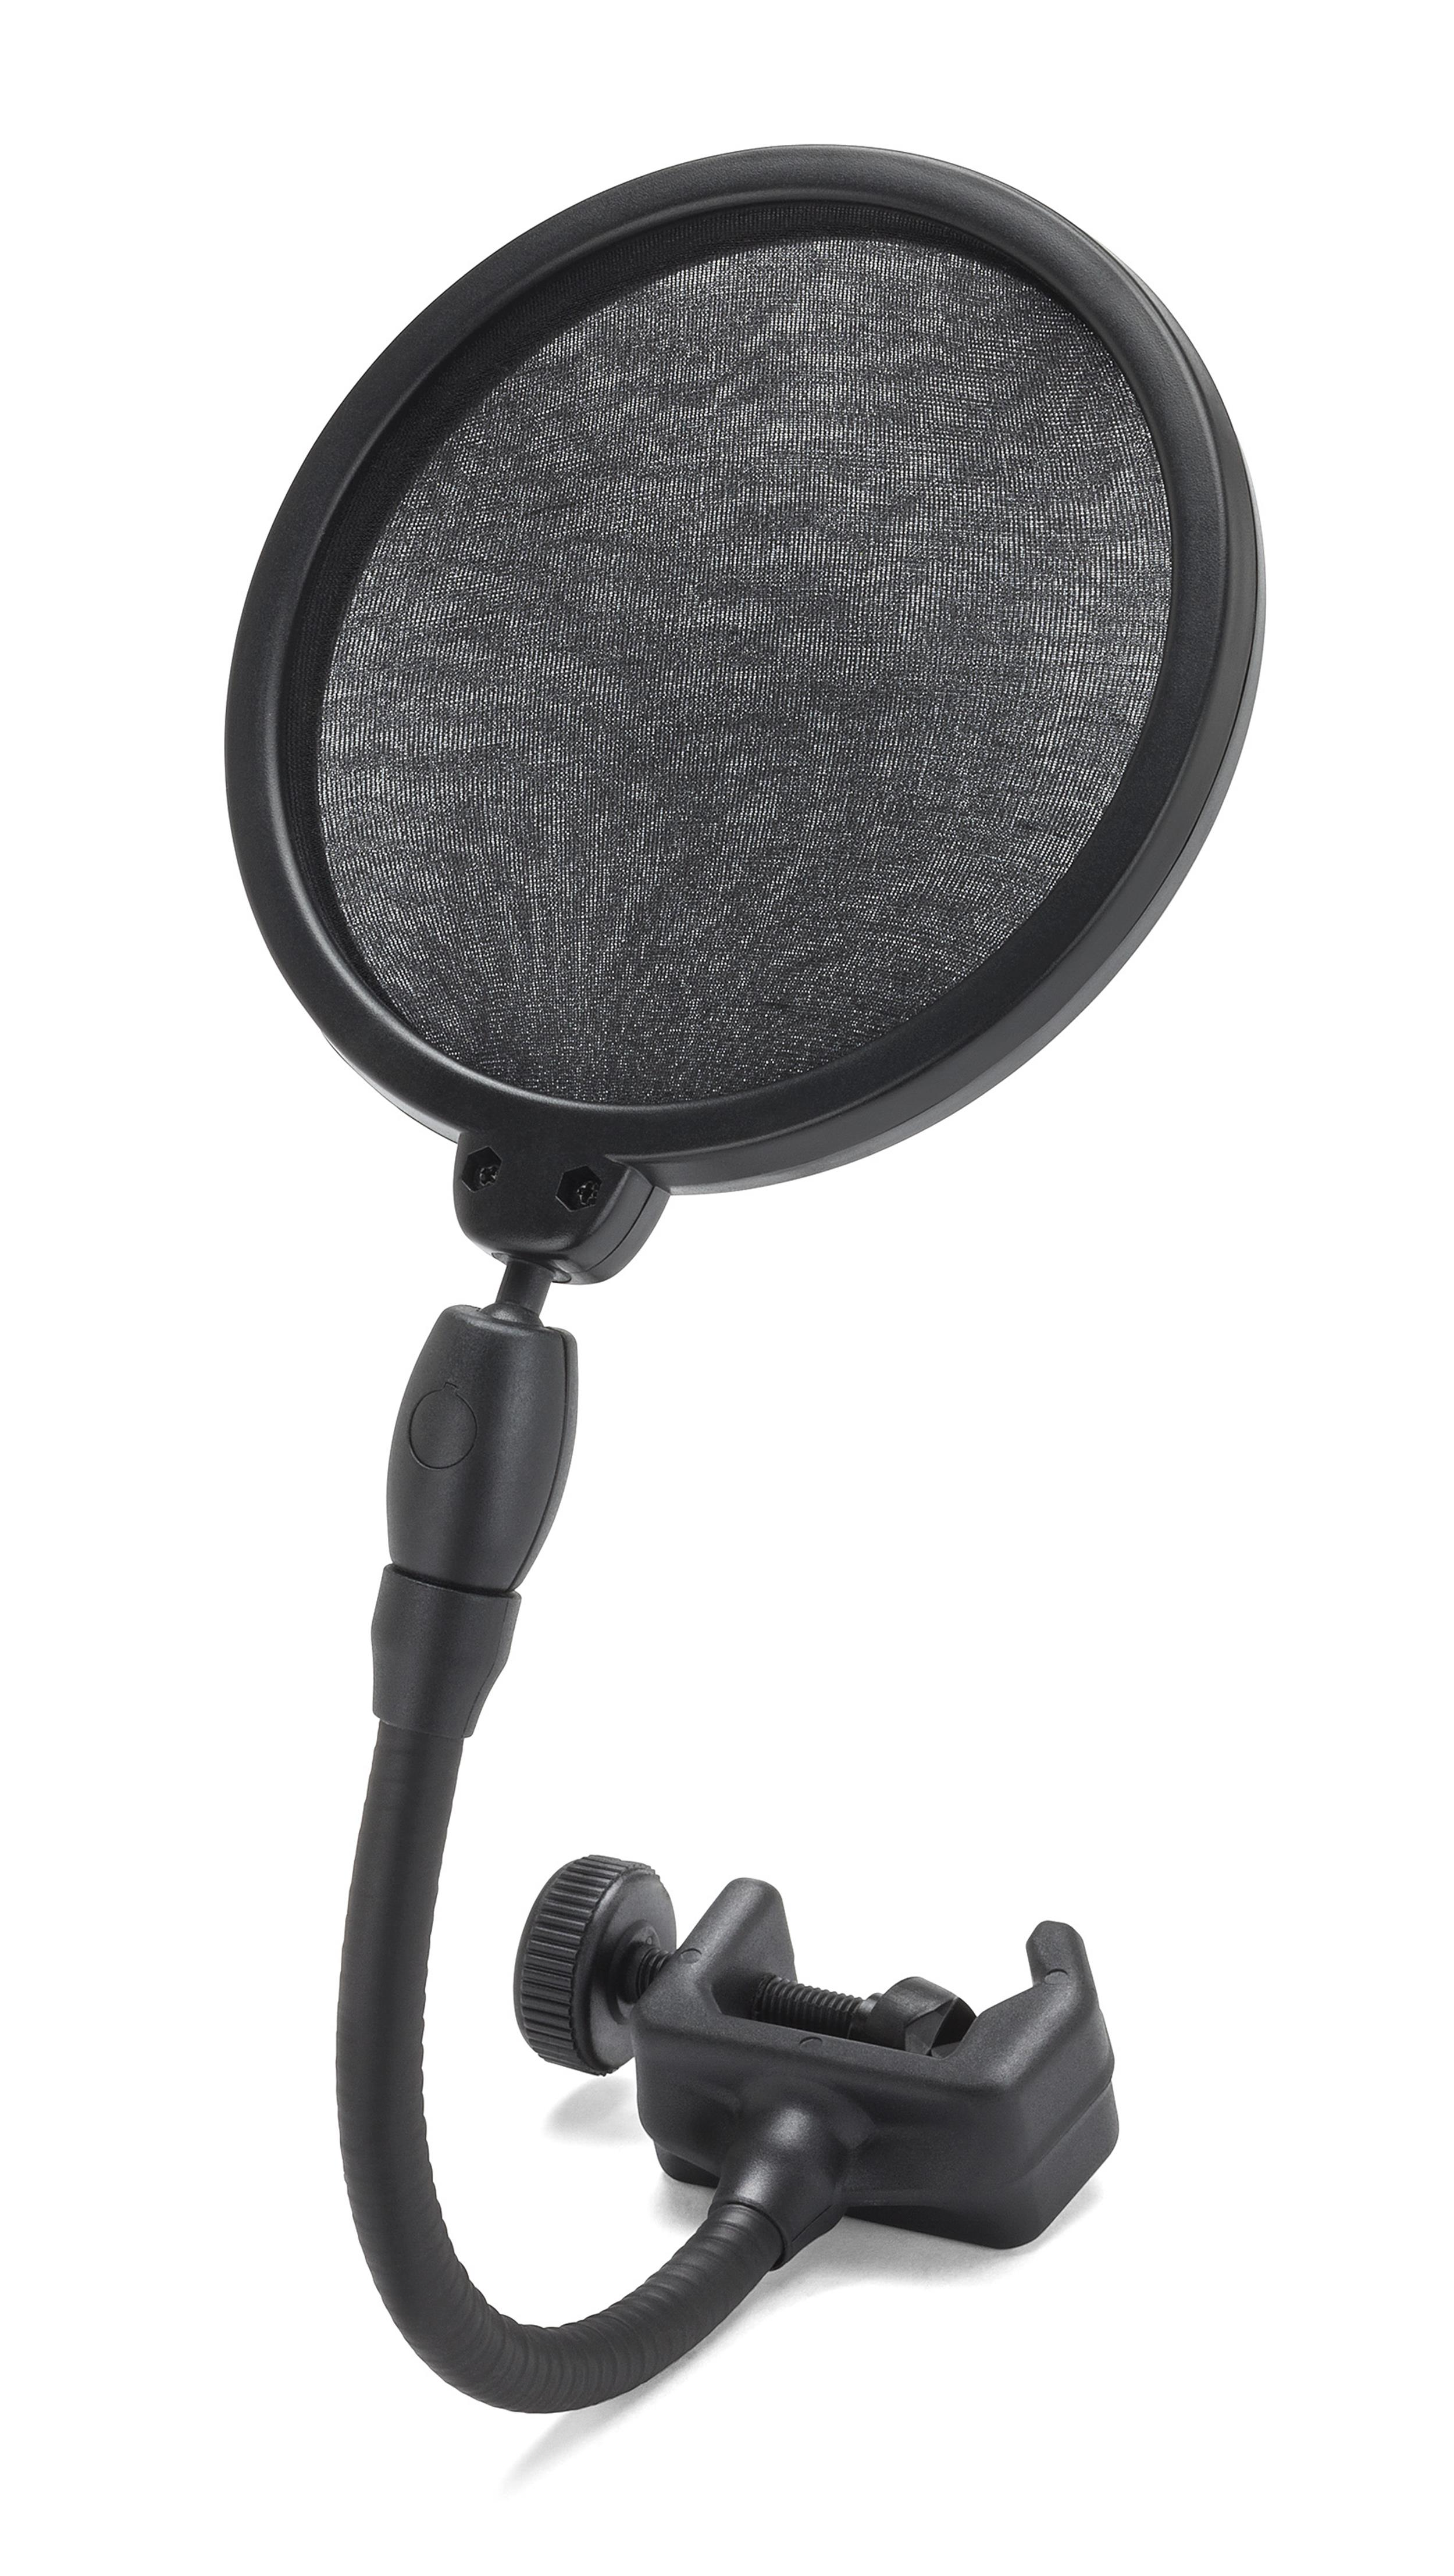 Samson PS05 - Microphone Pop Filter